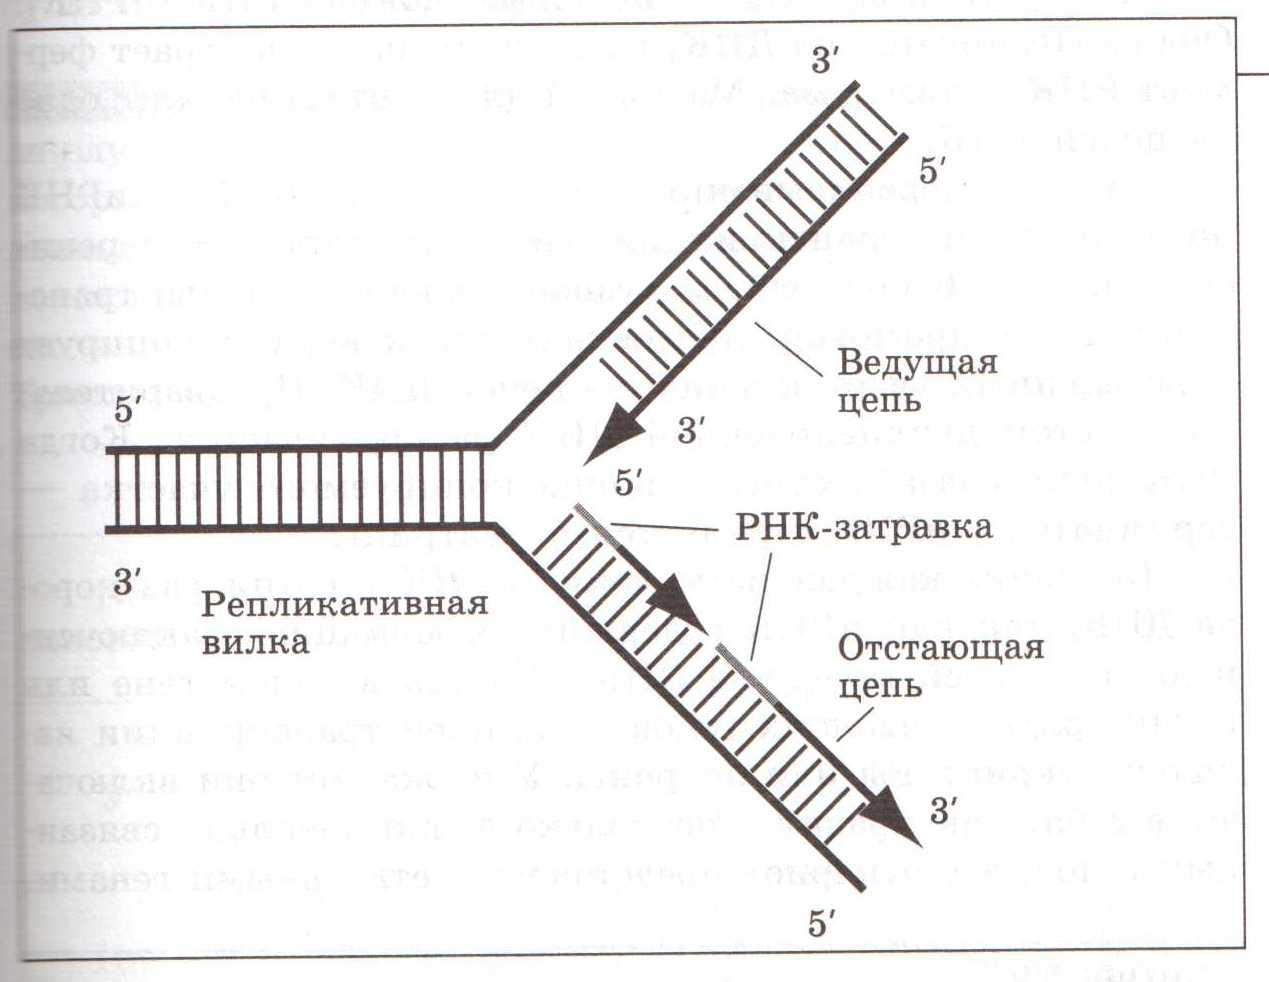 Тест по геометрии 7 класс белицкая ответы